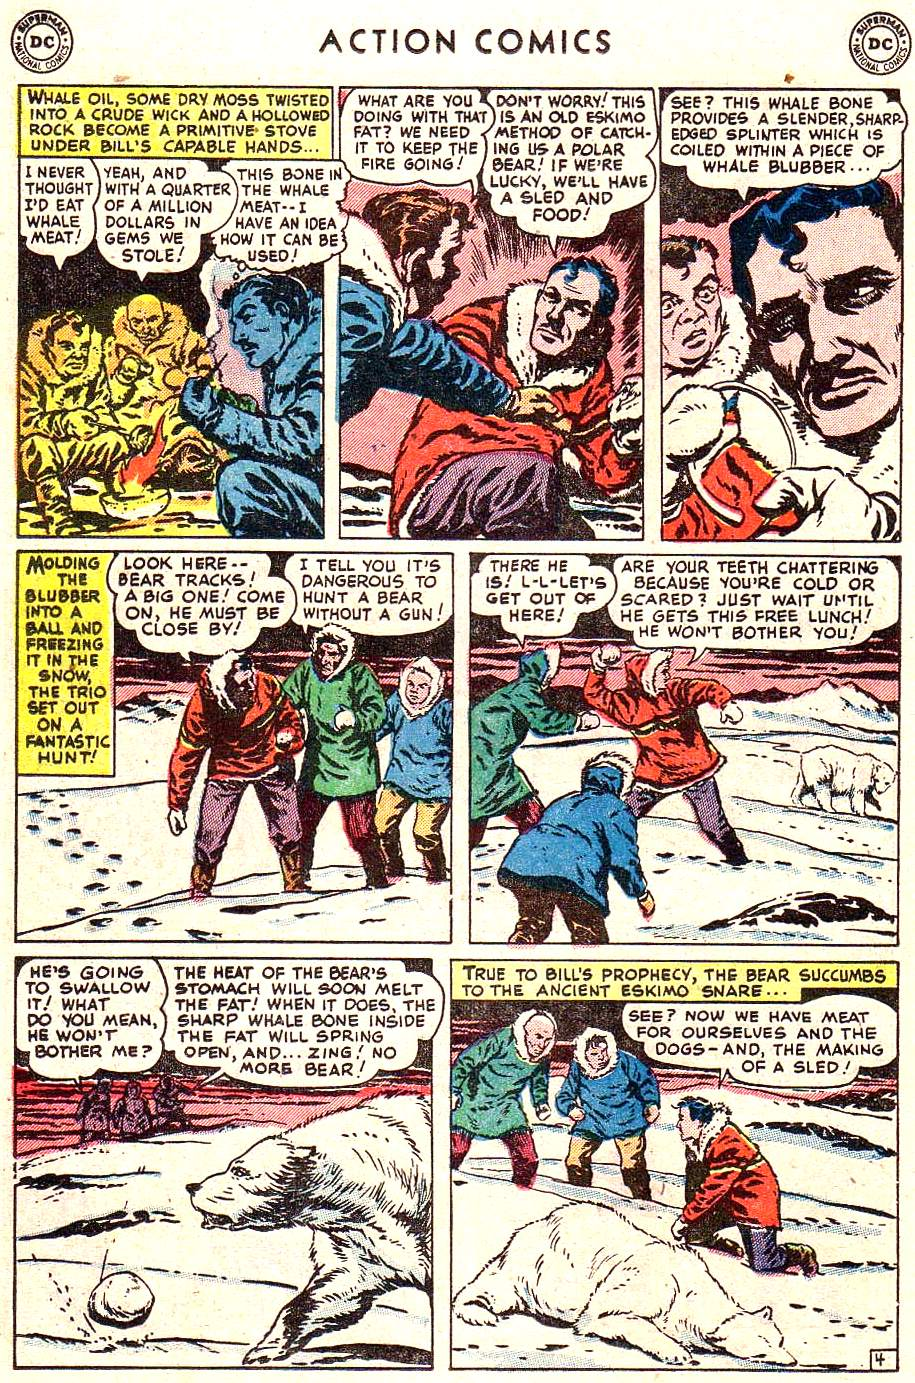 Action Comics (1938) 172 Page 19